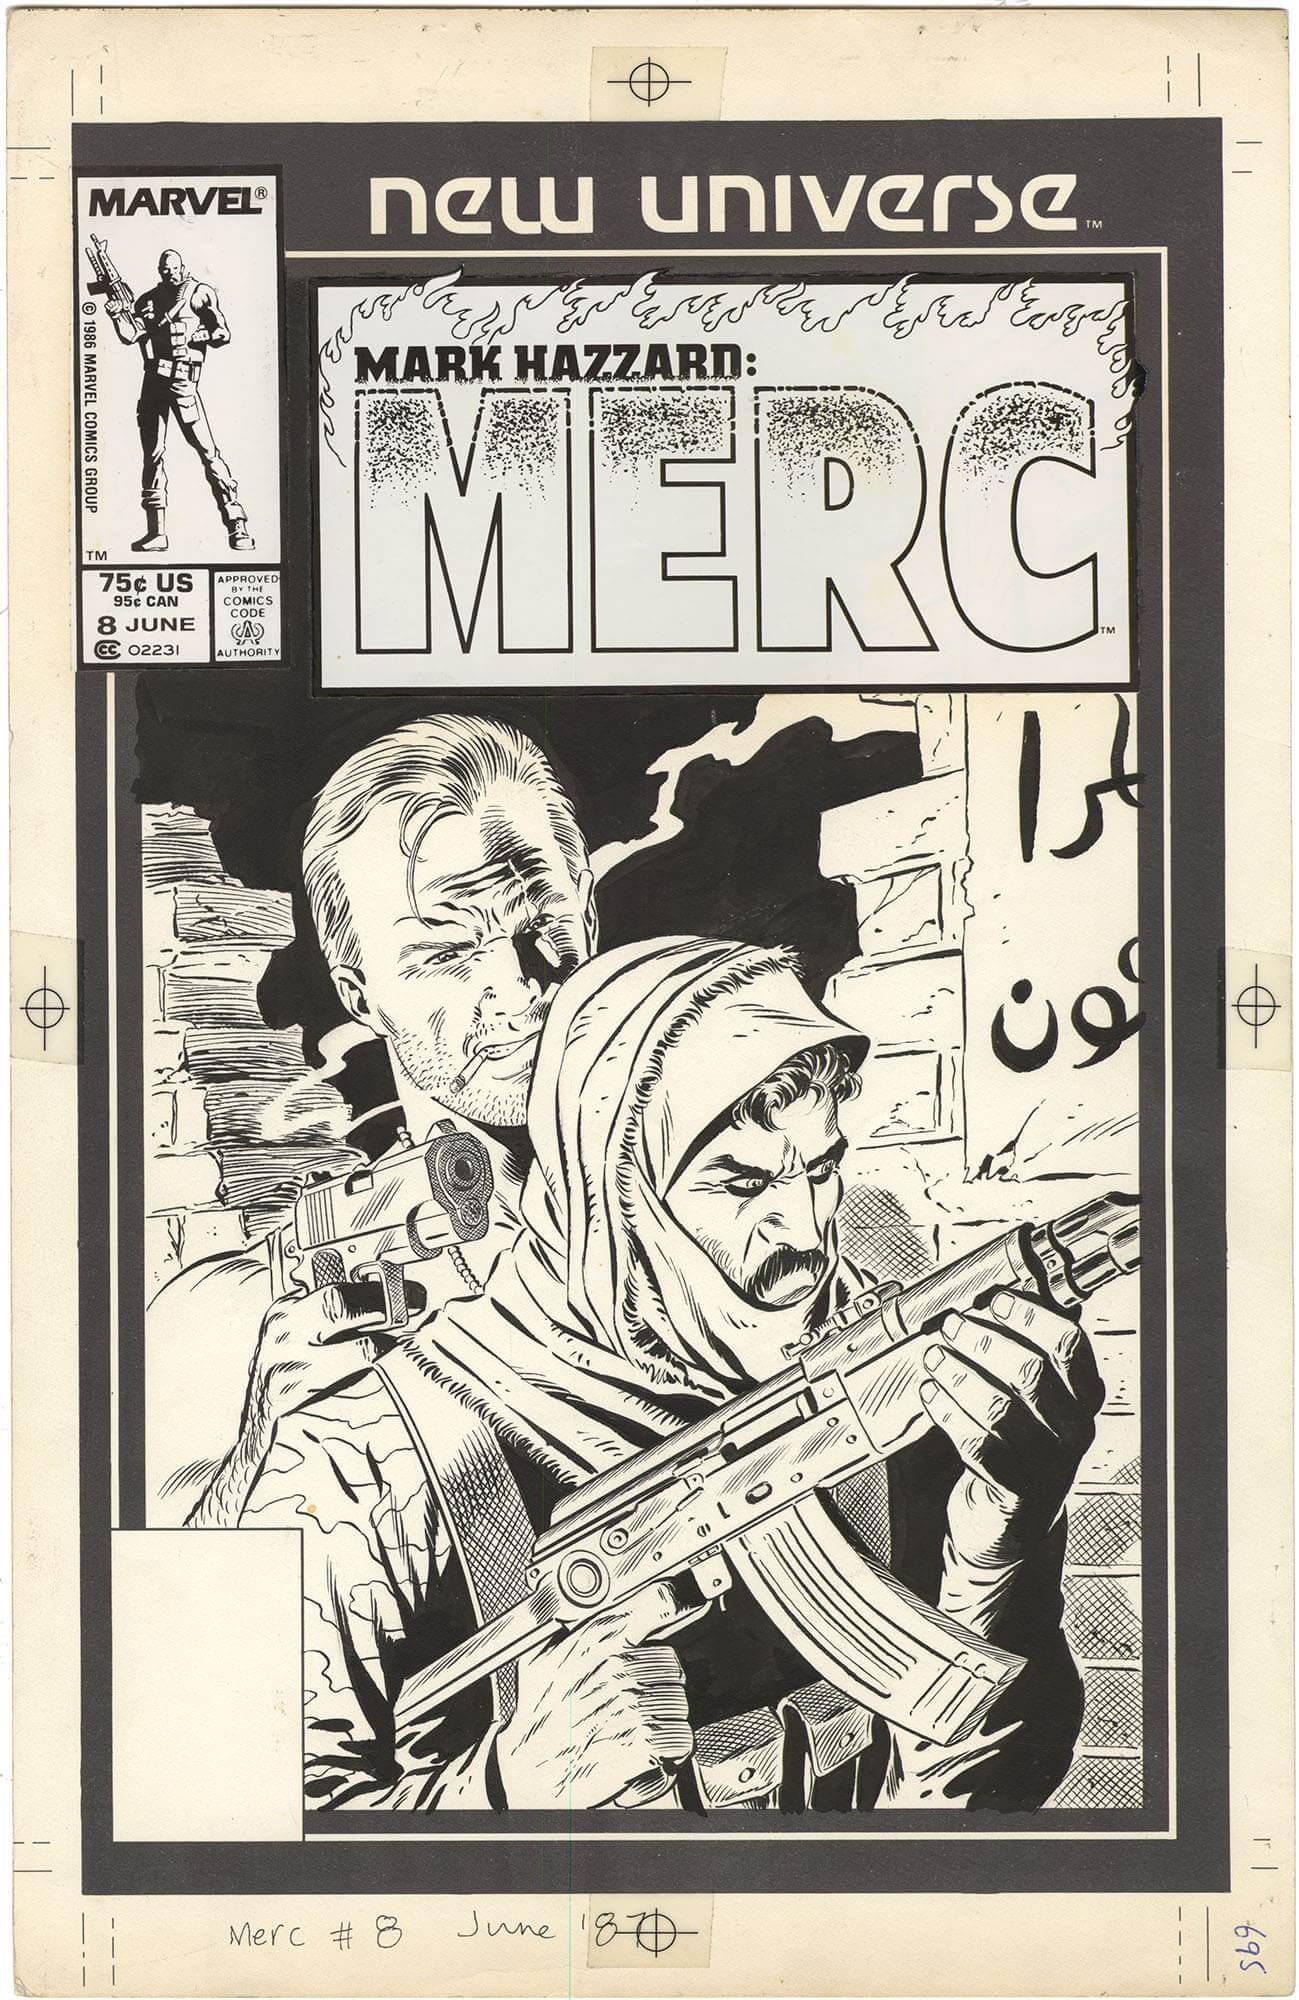 Mark Hazzard: Merc #8 Cover (Looks like Punisher)